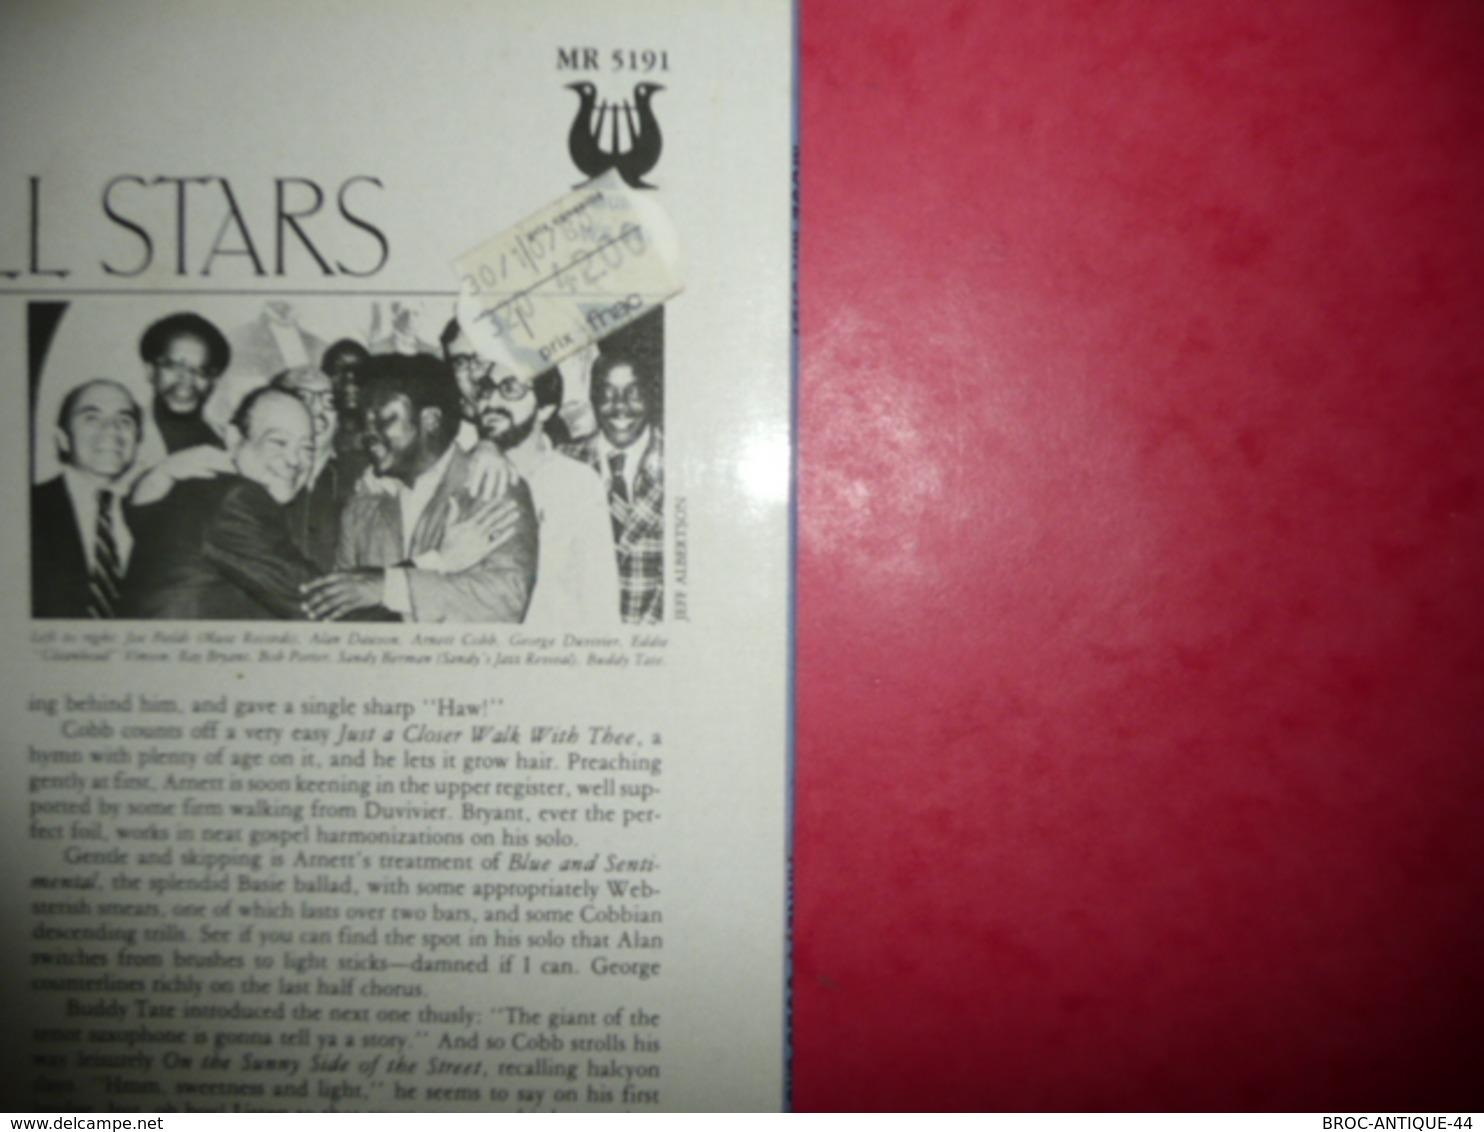 LP33 N°1352 - ARNETT COBB & MUSE ALL STARS - LIVE AT SANDY'S  ! - COMPILATION 5 TITRES - Jazz